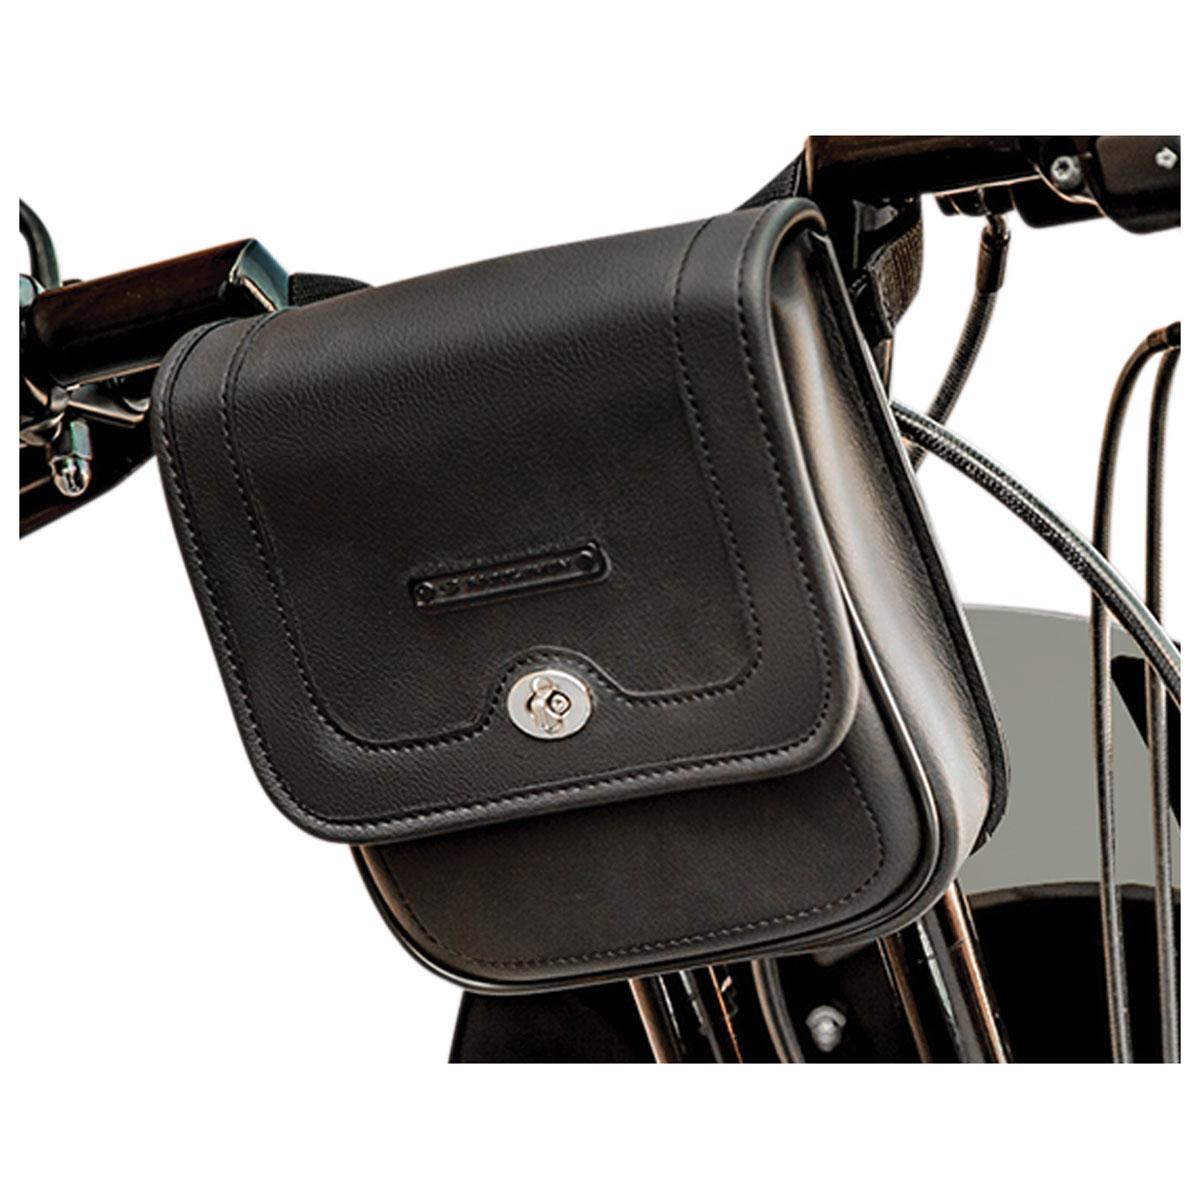 Saddlemen D144 Bar Bag